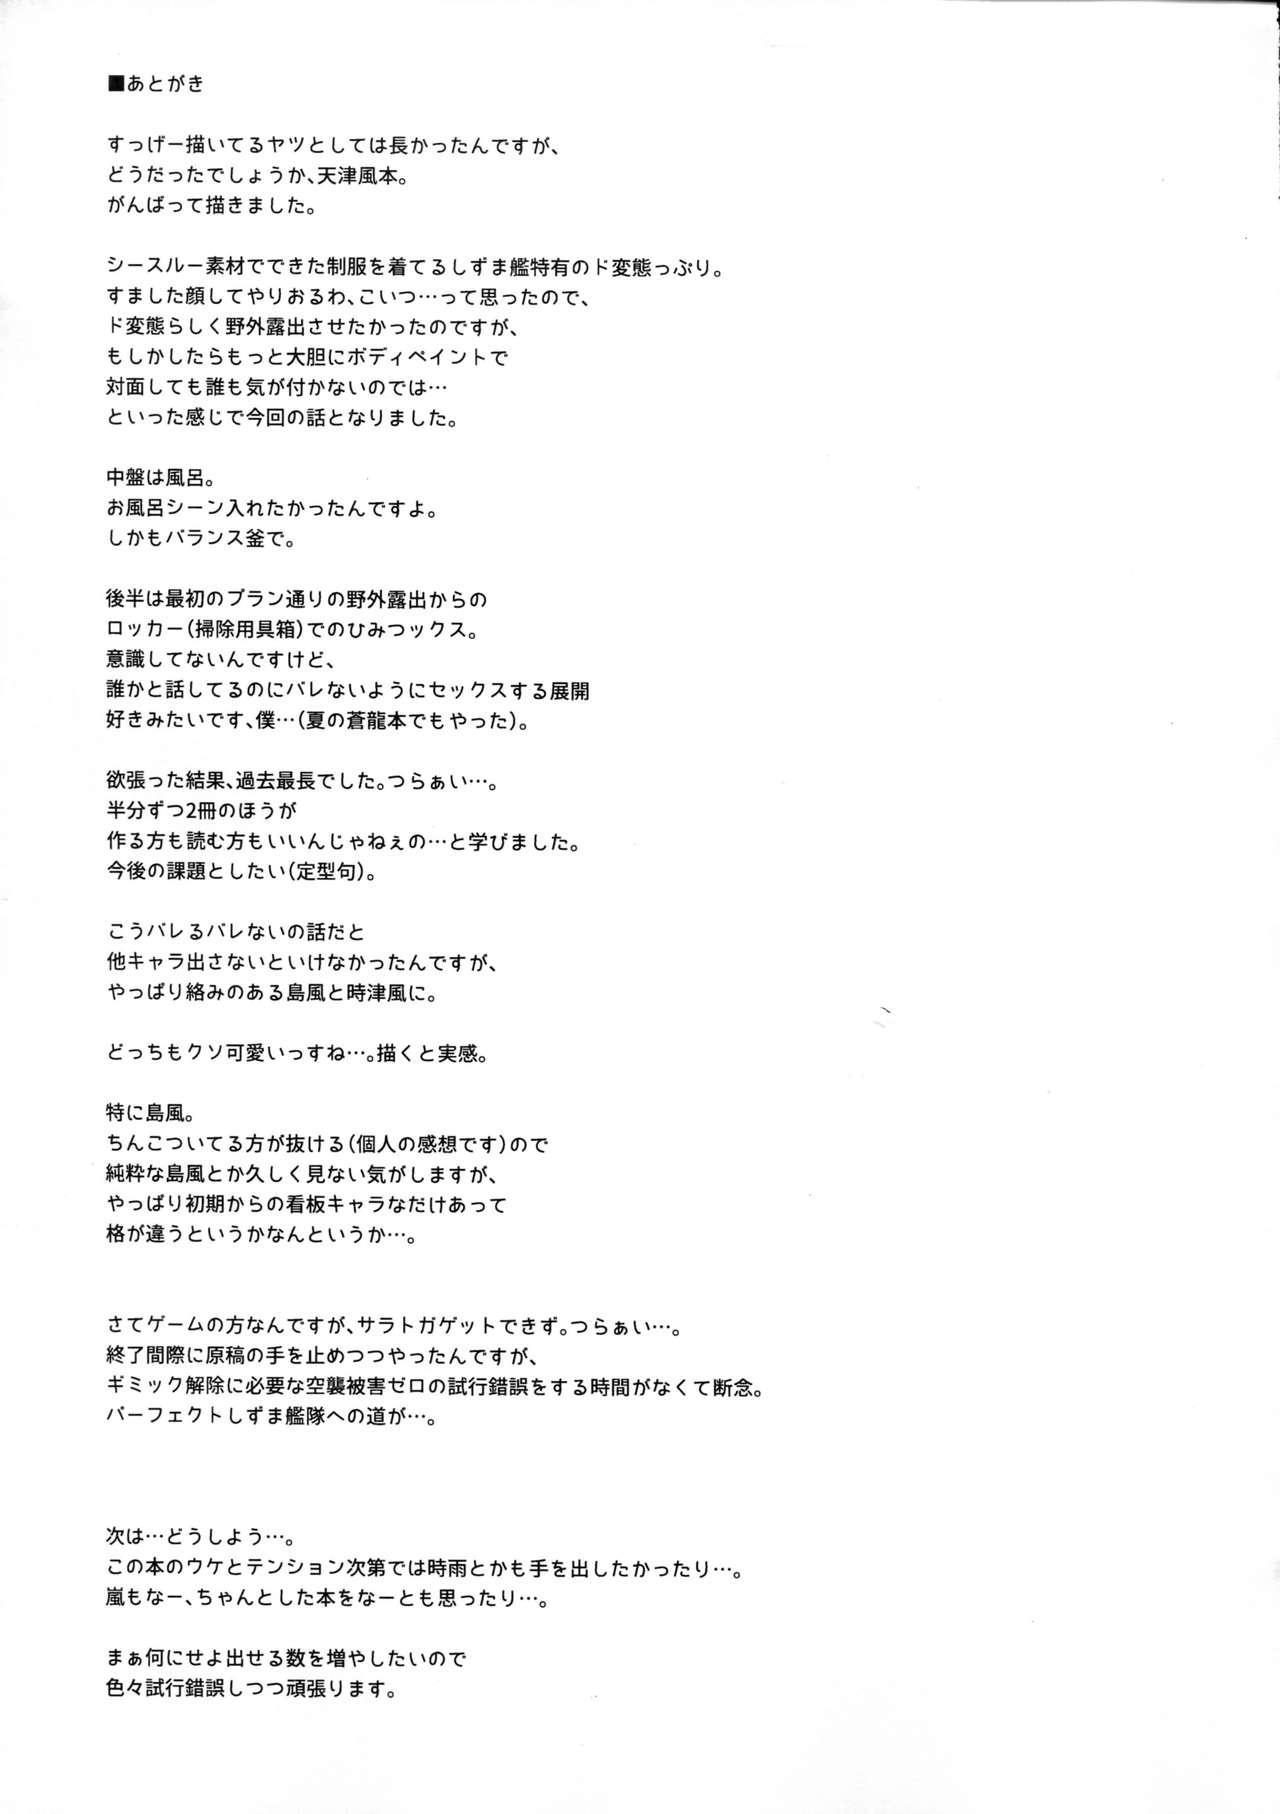 Himitsukaze 36